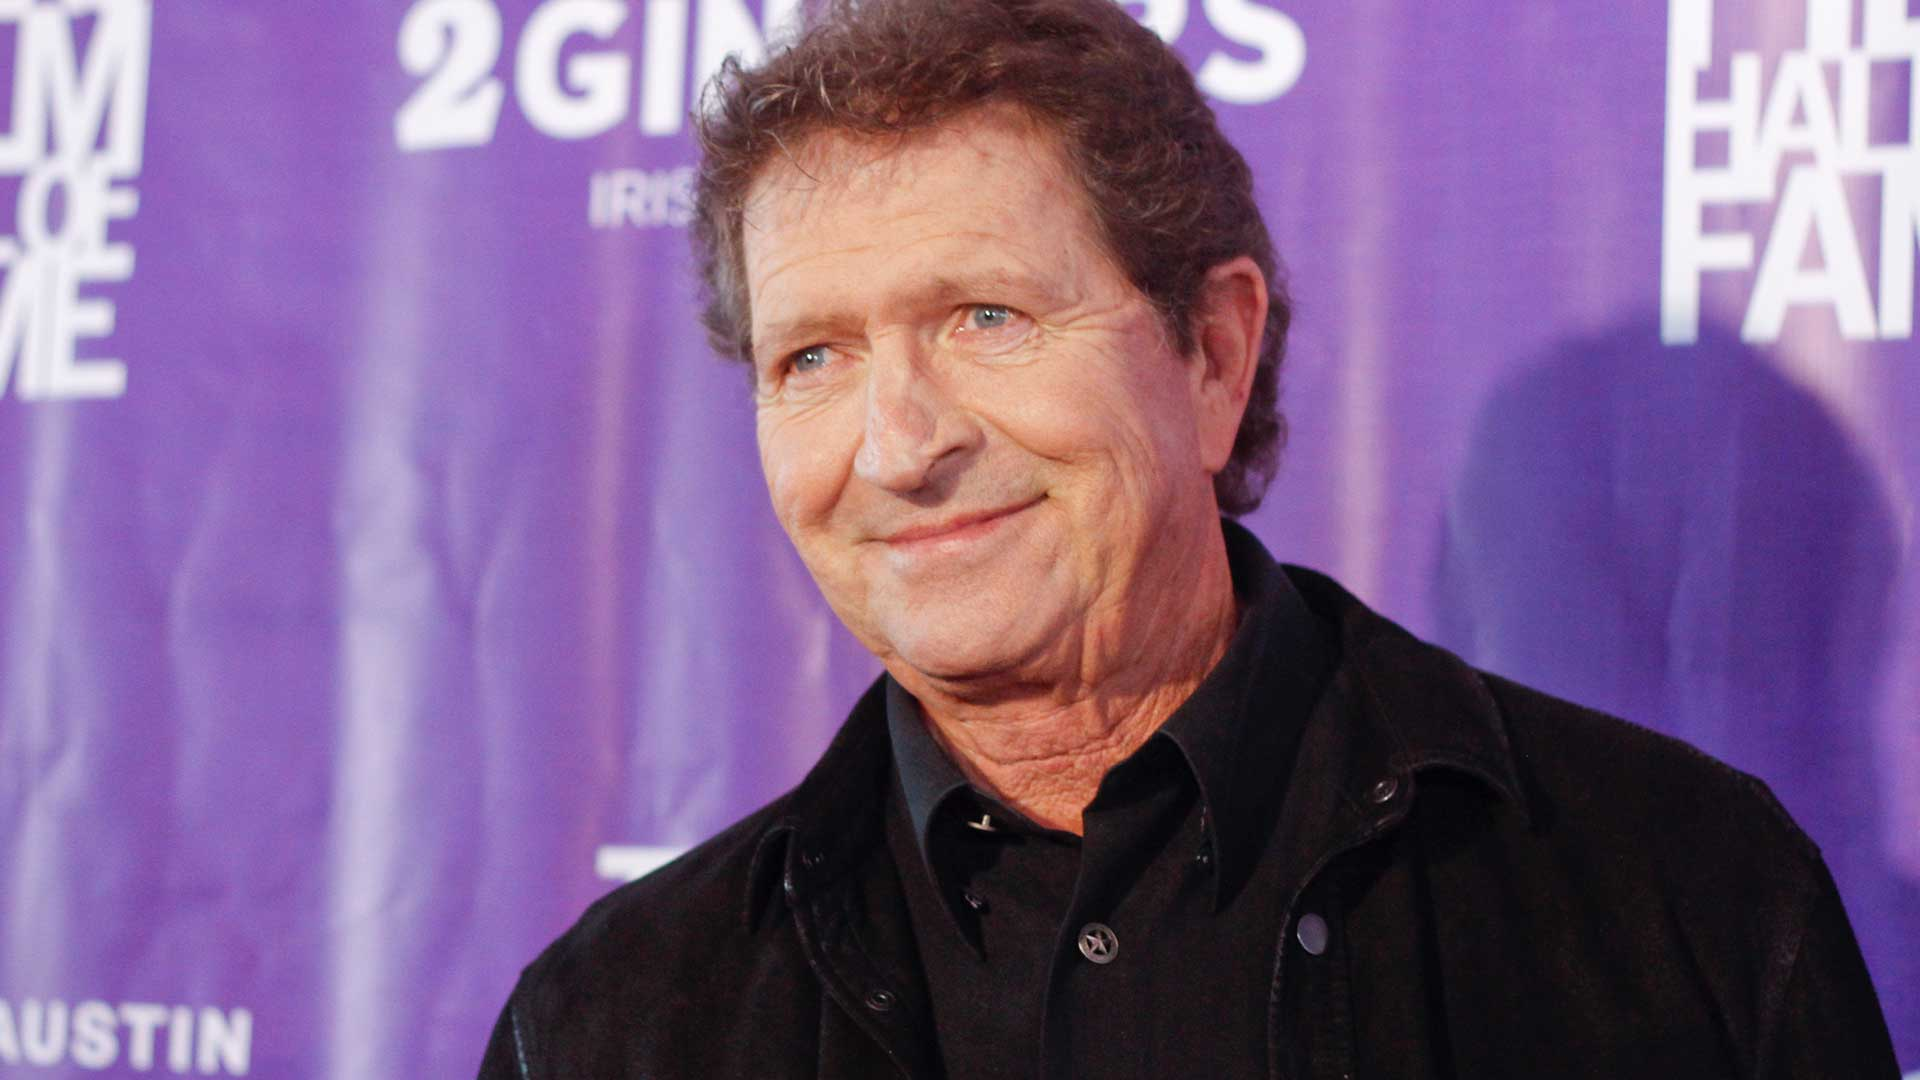 Country star and hit Elvis songwriter Mac Davis dies at 78